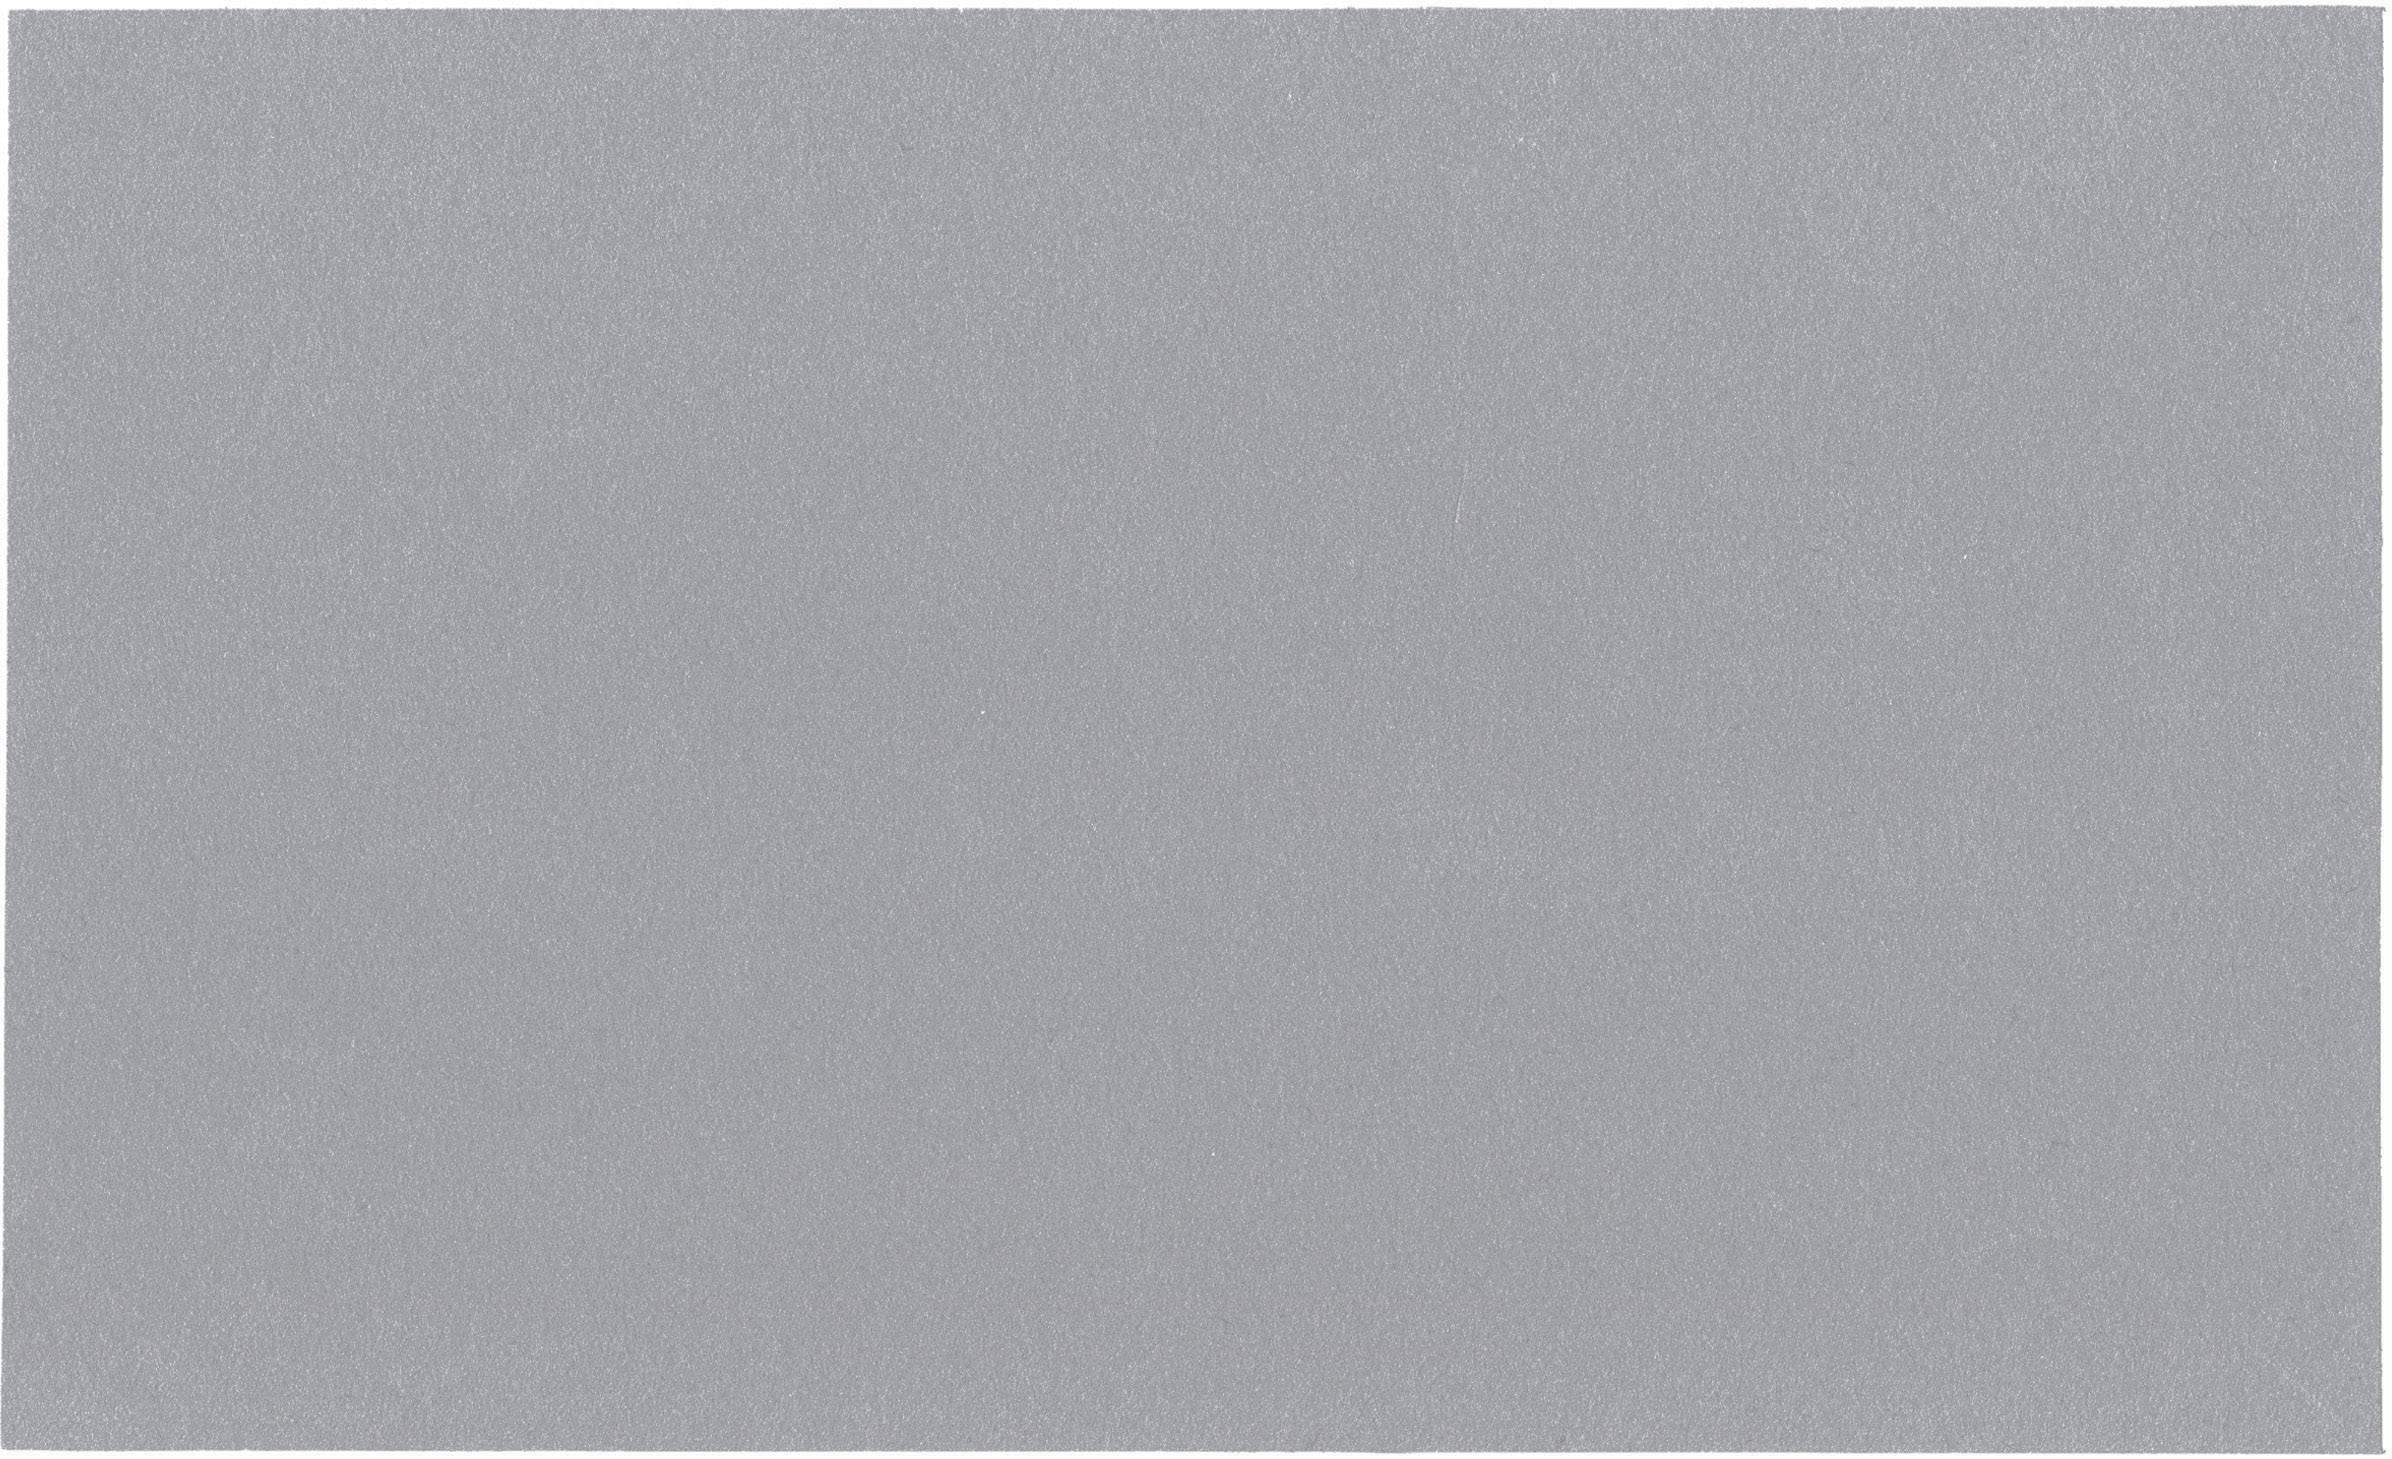 Teplovodivá fólia Kerafol SOFTTHERM 86/600, 0.5 mm, 6 W/mK, (d x š) 200 mm x 120 mm